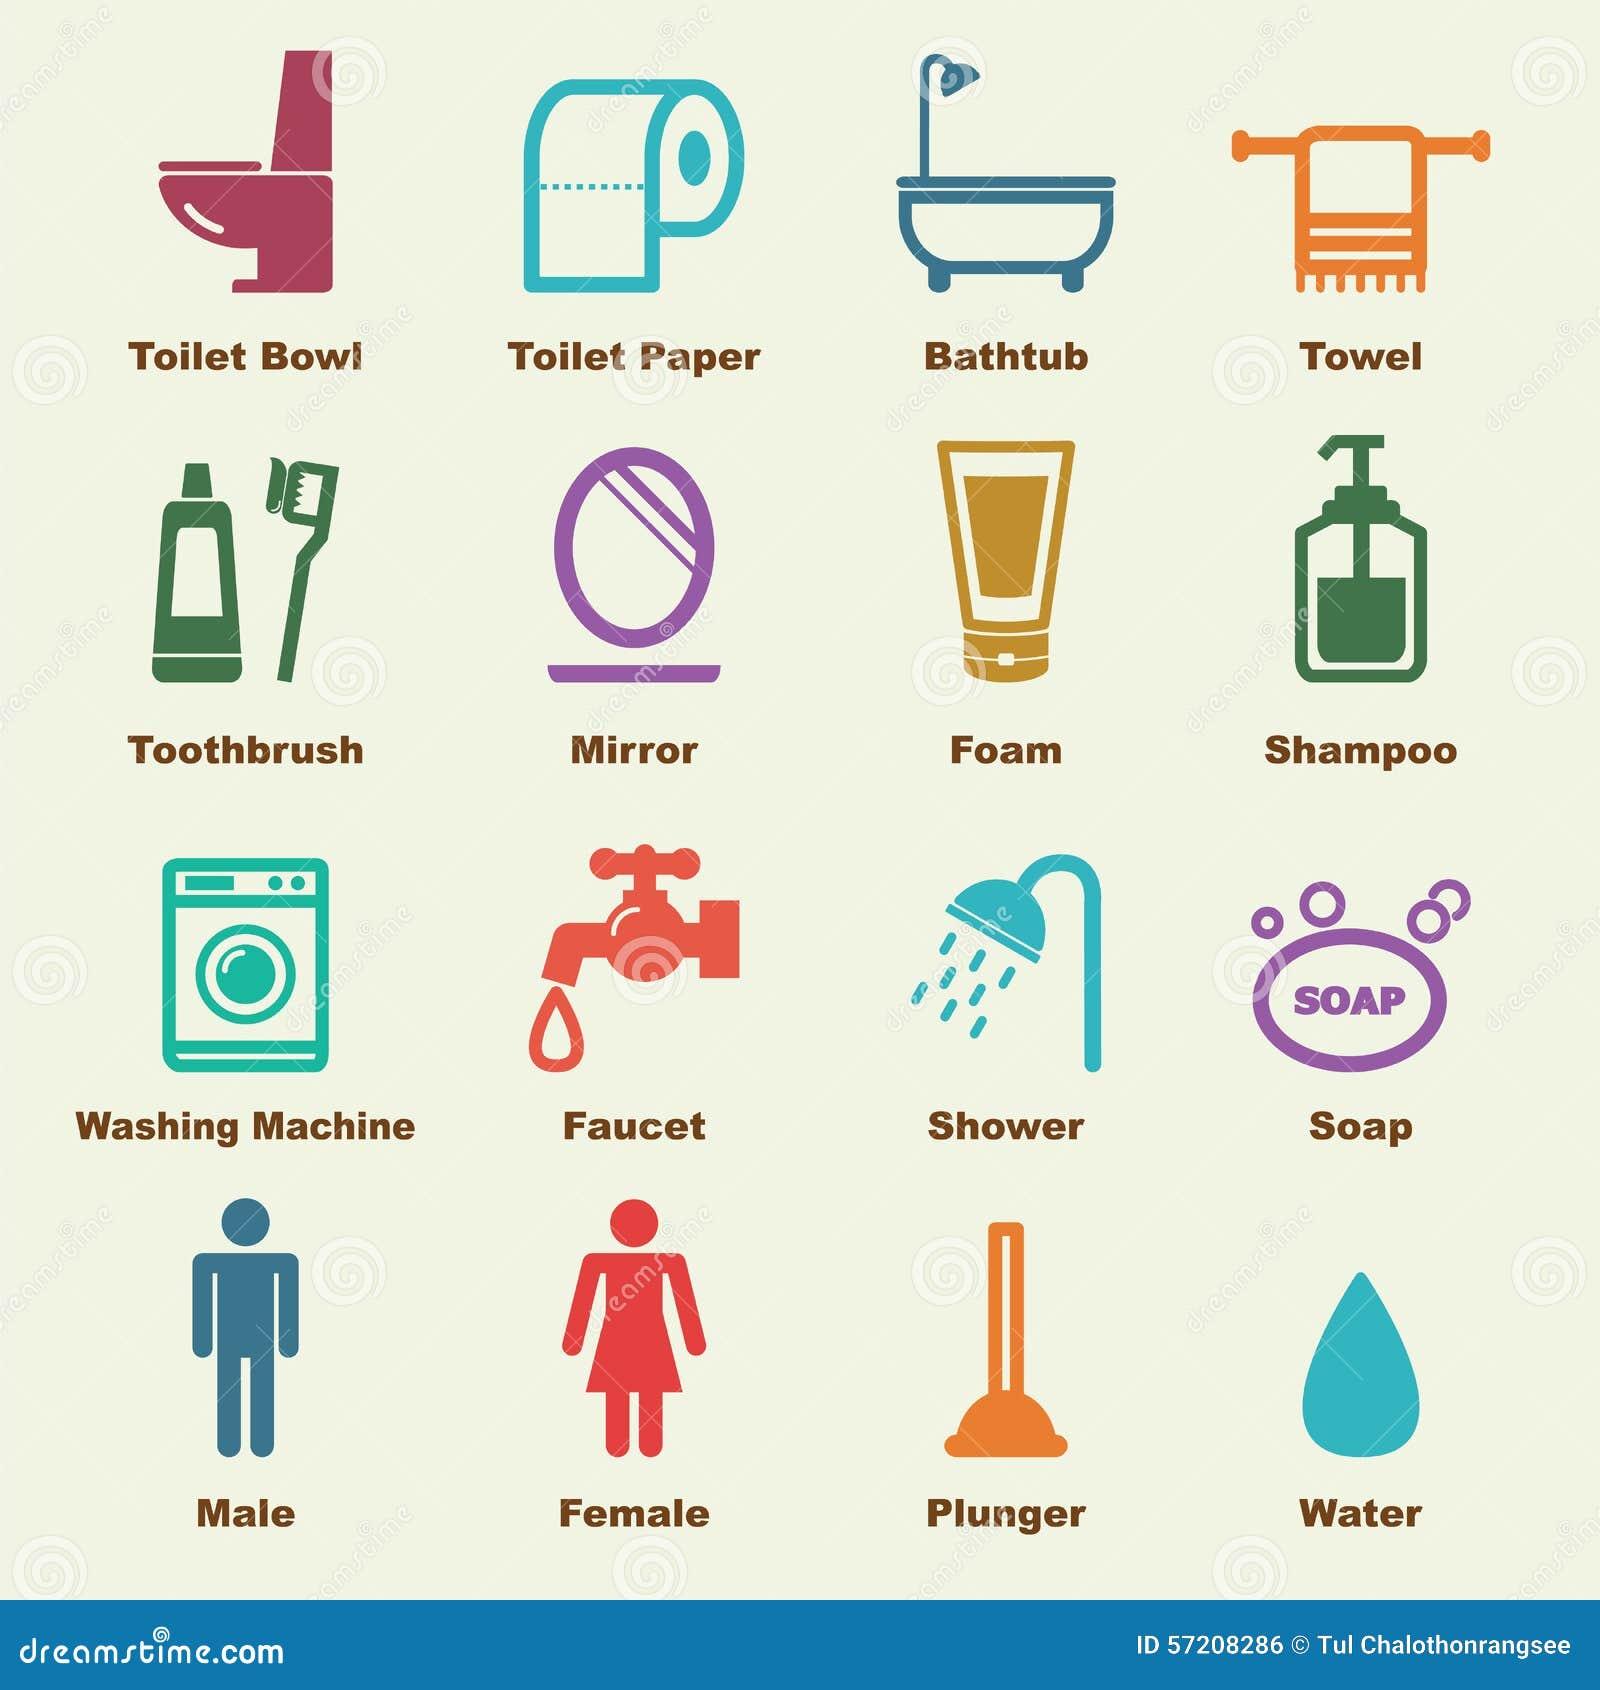 Bathroom Elements Stock Vector - Image: 57208286